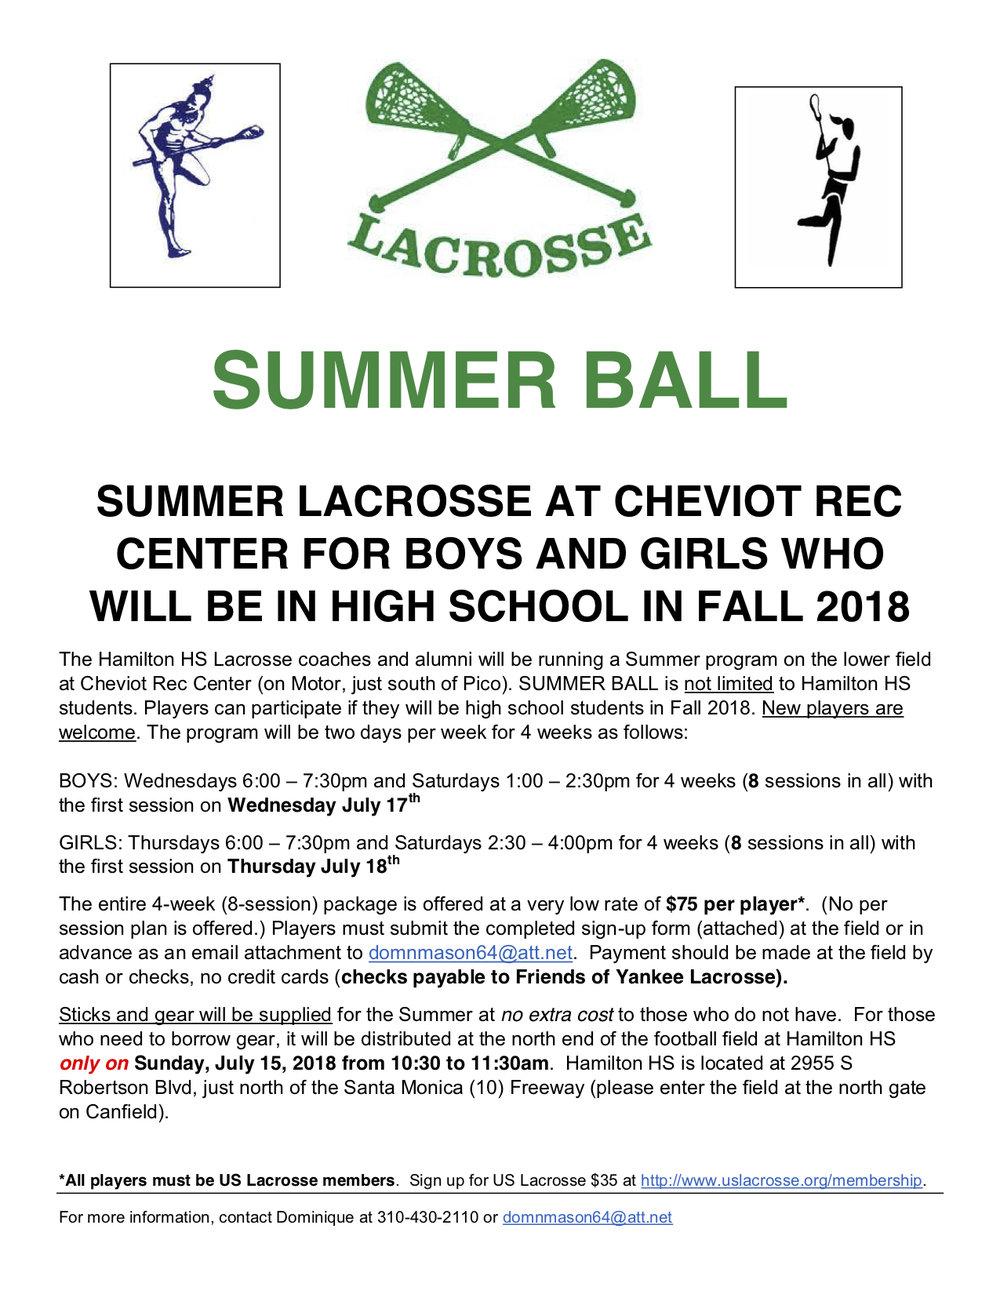 2018 Summer Lacrosse Flyer at Cheviot.jpg